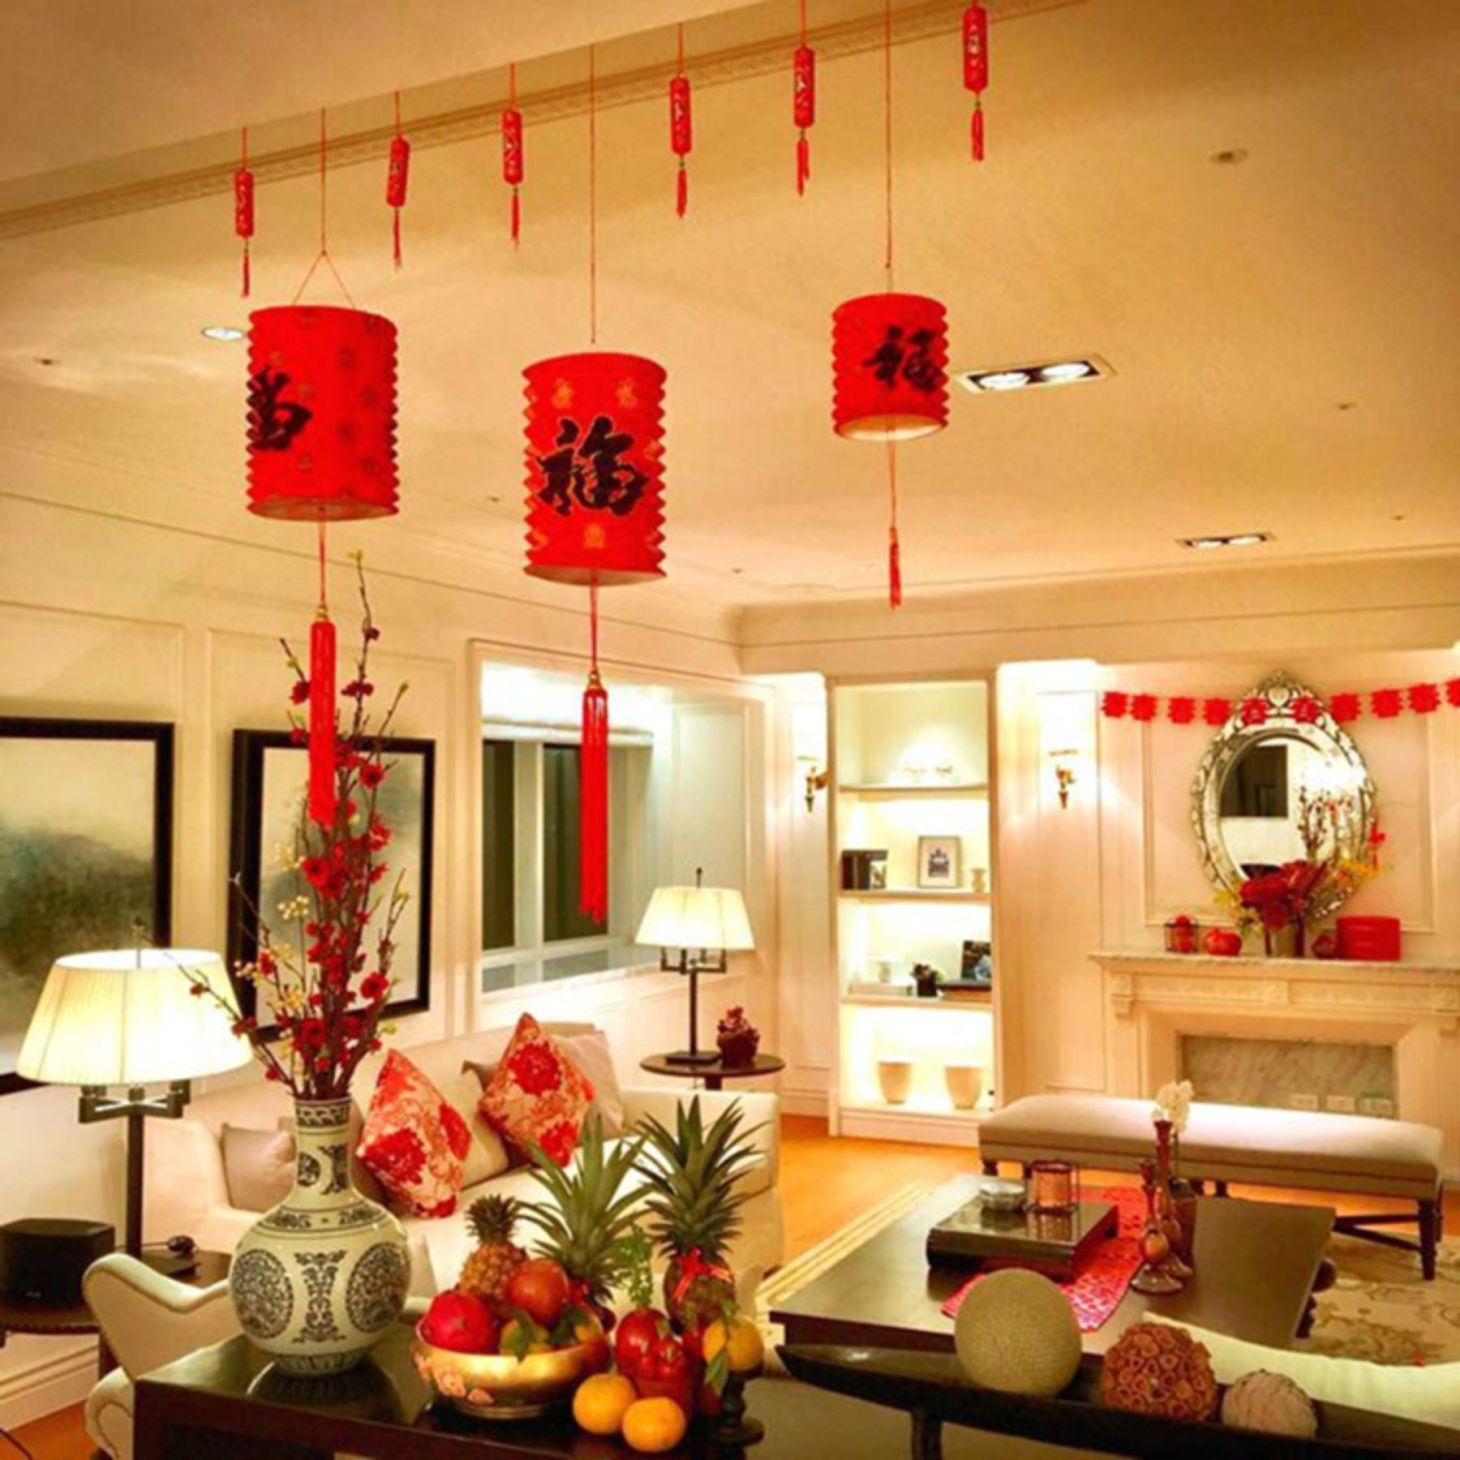 Best Living Room Design And Decoration To Make Chinese New Year Happy Chinese New Year Decorations Chinese Decor New Years Decorations